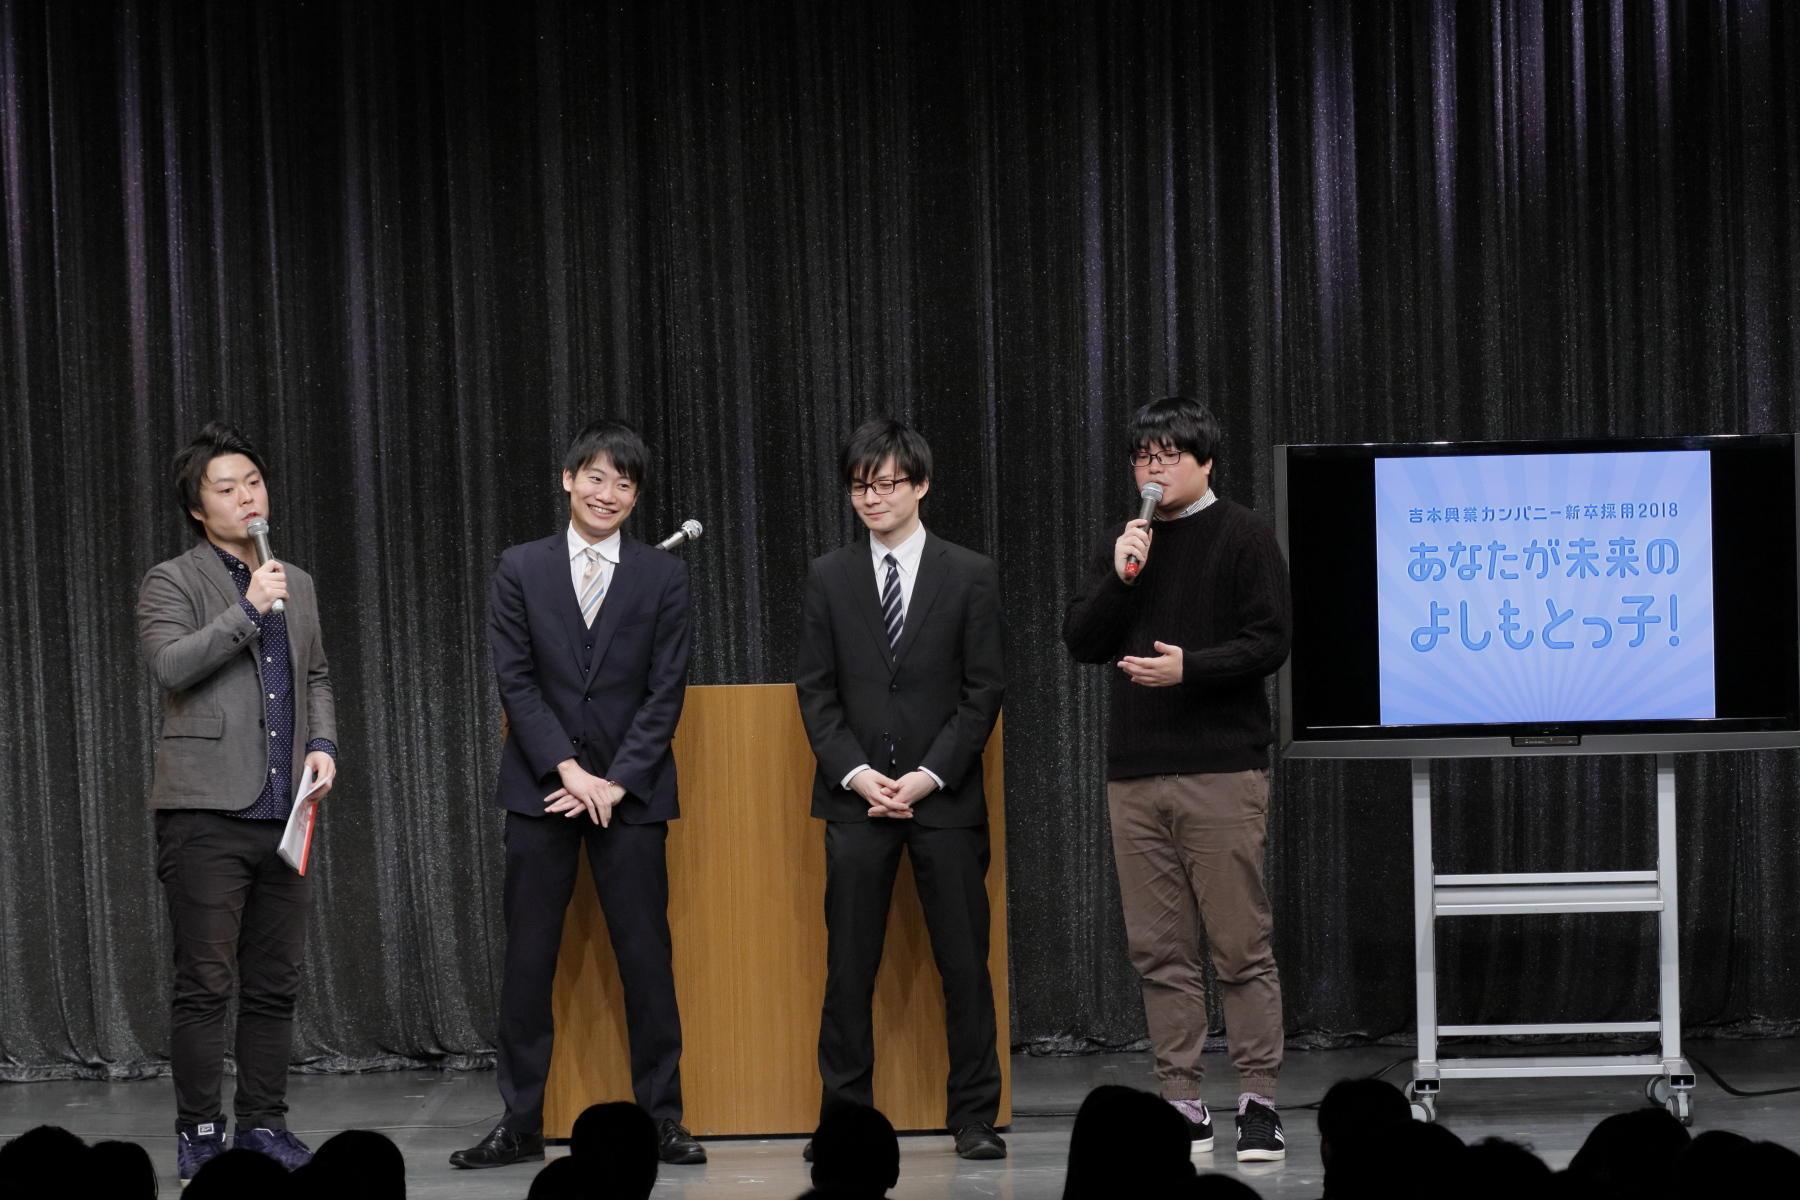 http://news.yoshimoto.co.jp/20170315170631-ecd8d6fd7fb07f9ca04739b146d87dc3adc04c7b.jpg